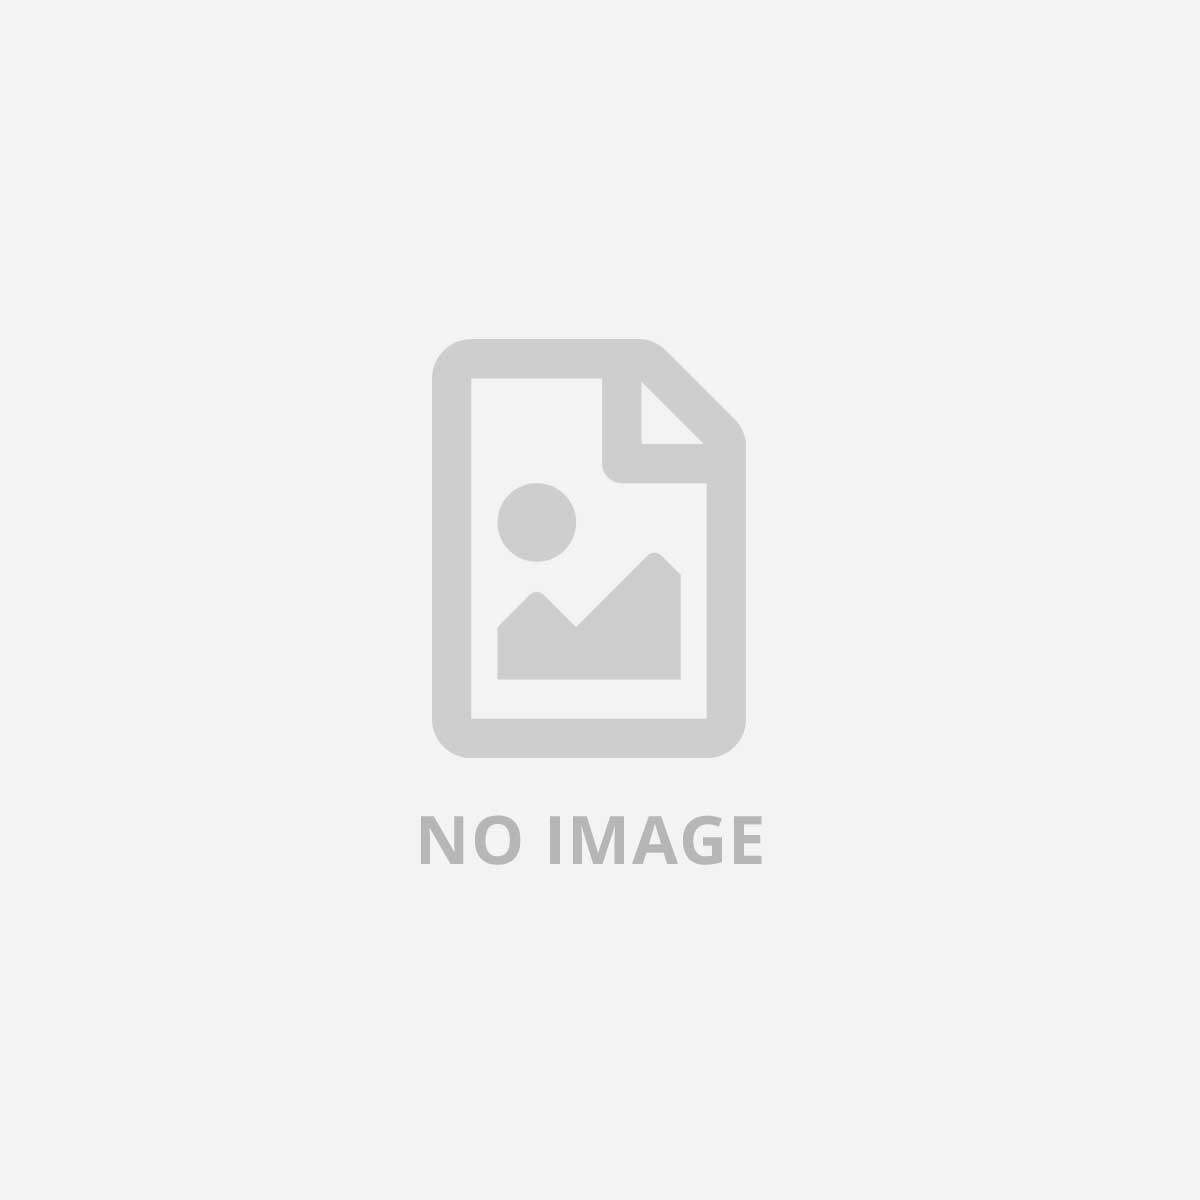 EPSON CARTA FOTOGR.SEMILUCIDA A3+ 20FG